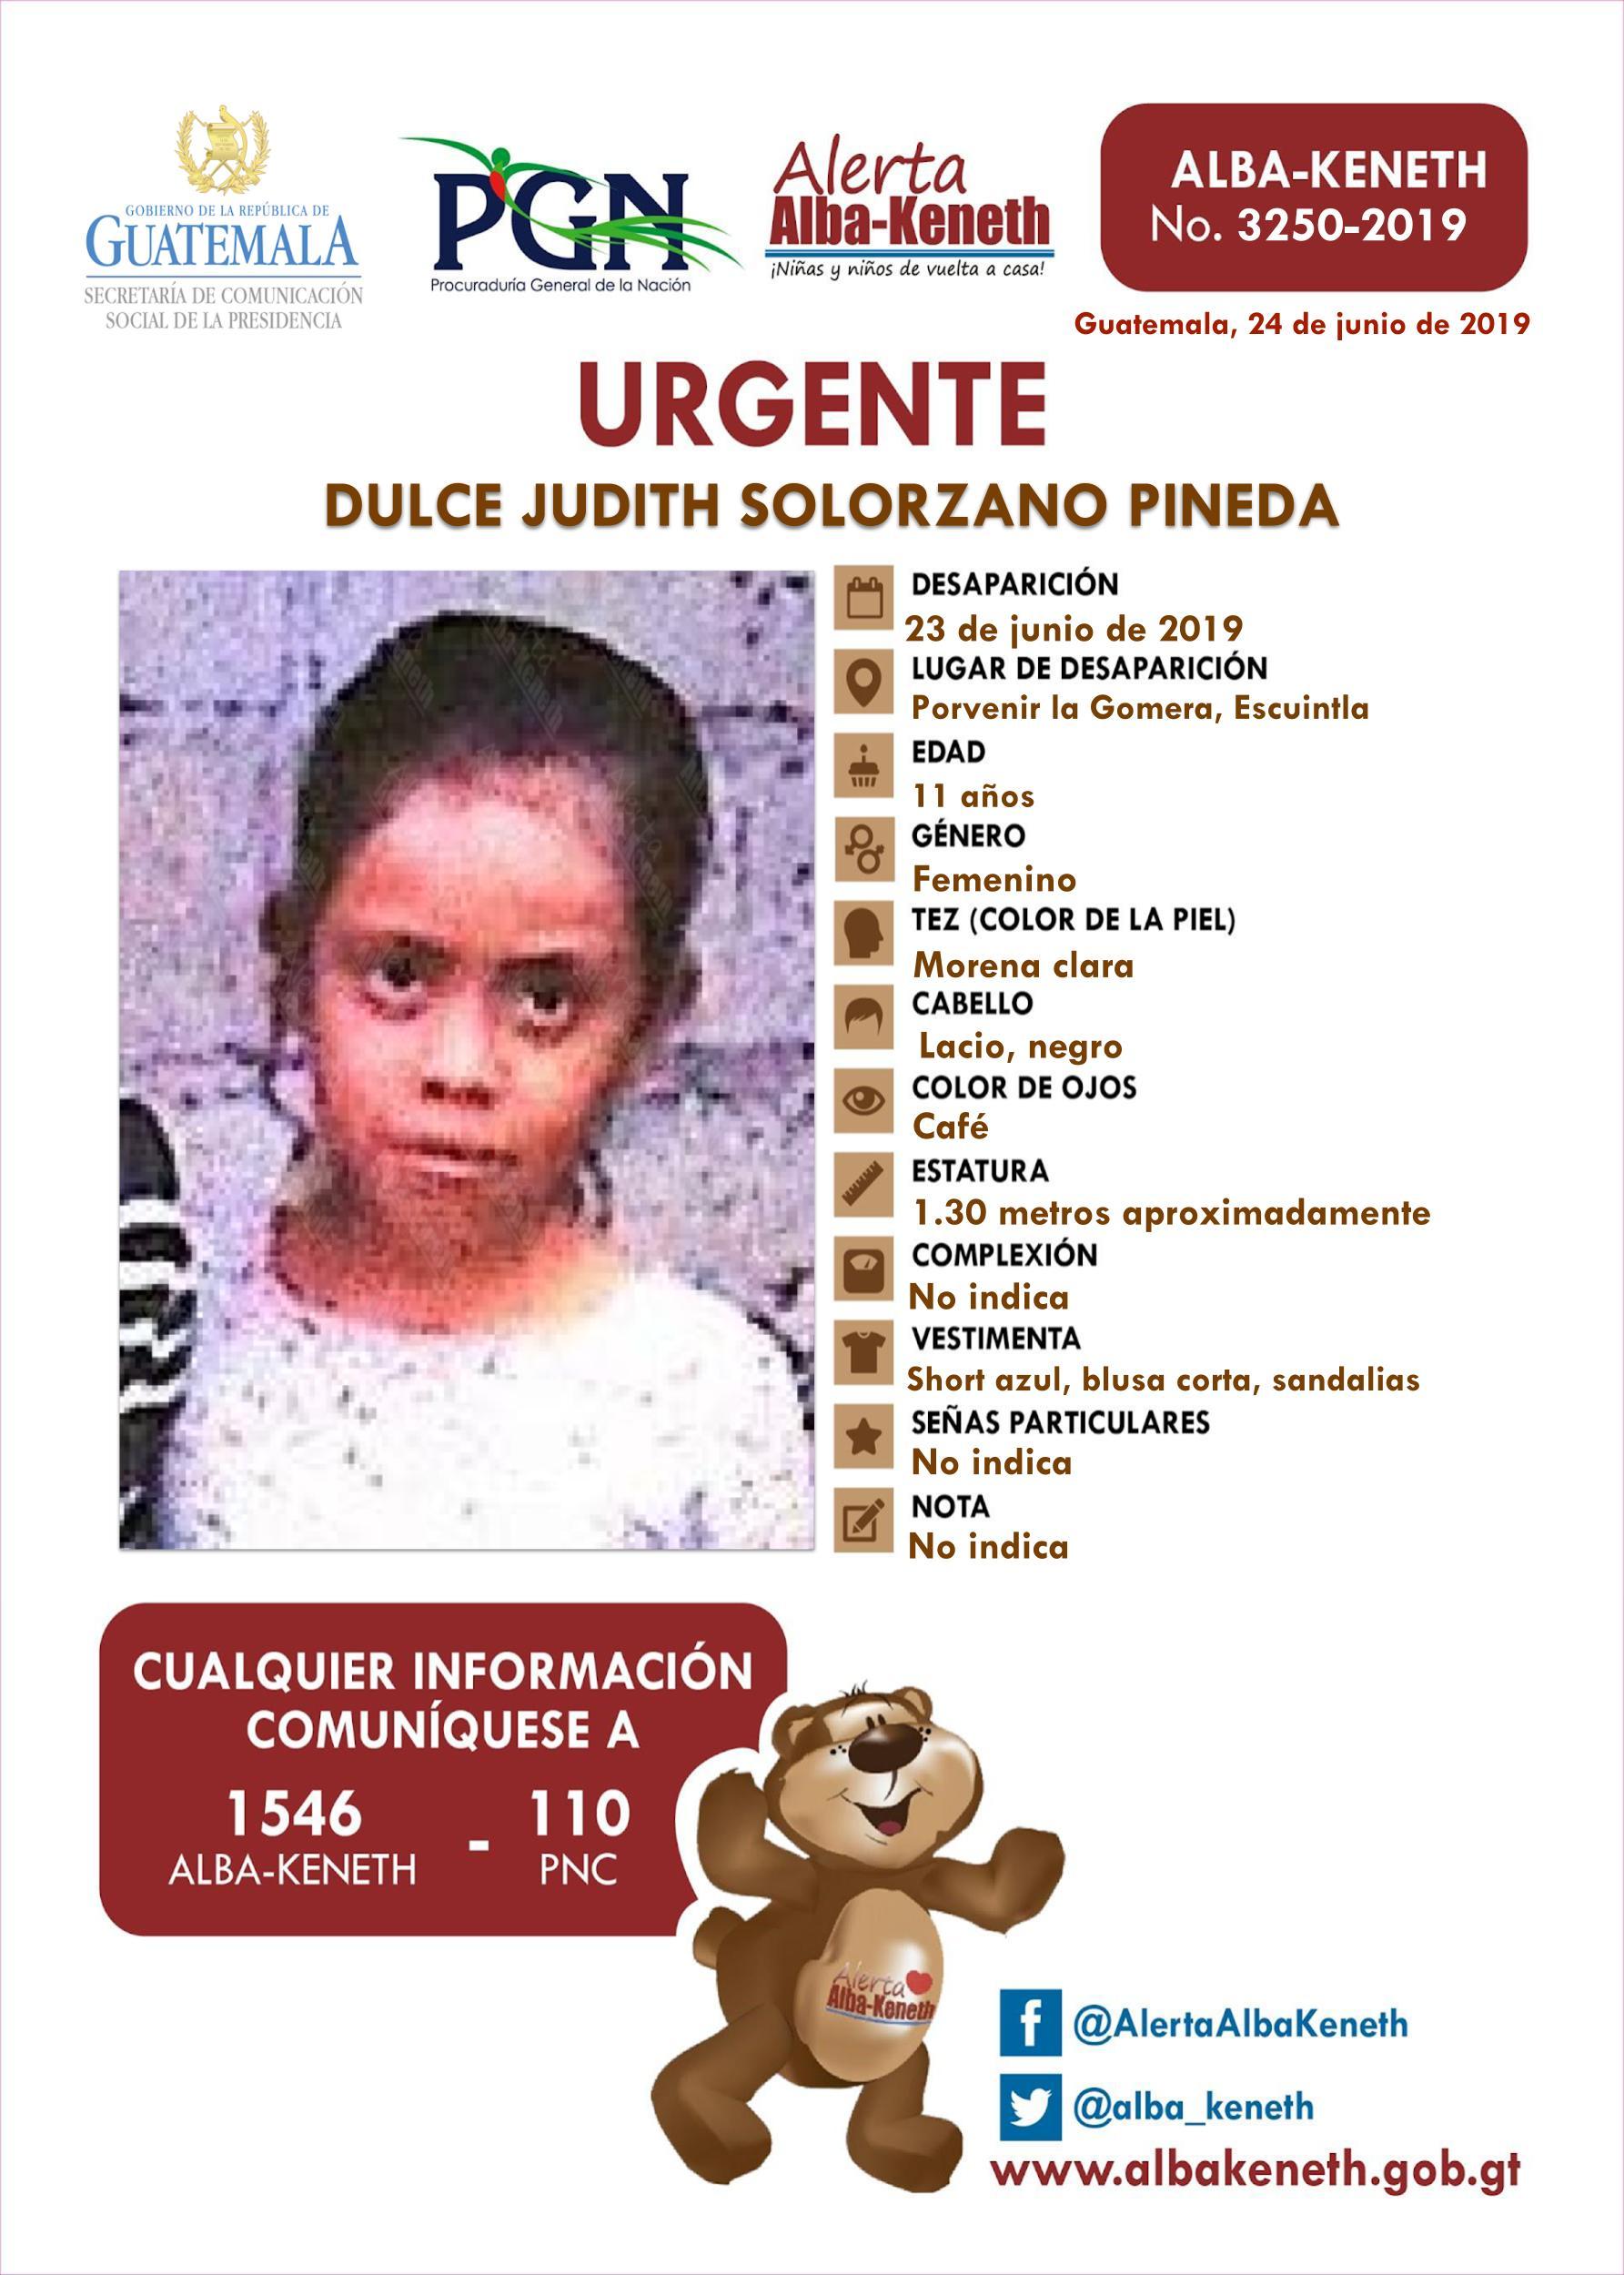 Dulce Judith Solorzano Pineda